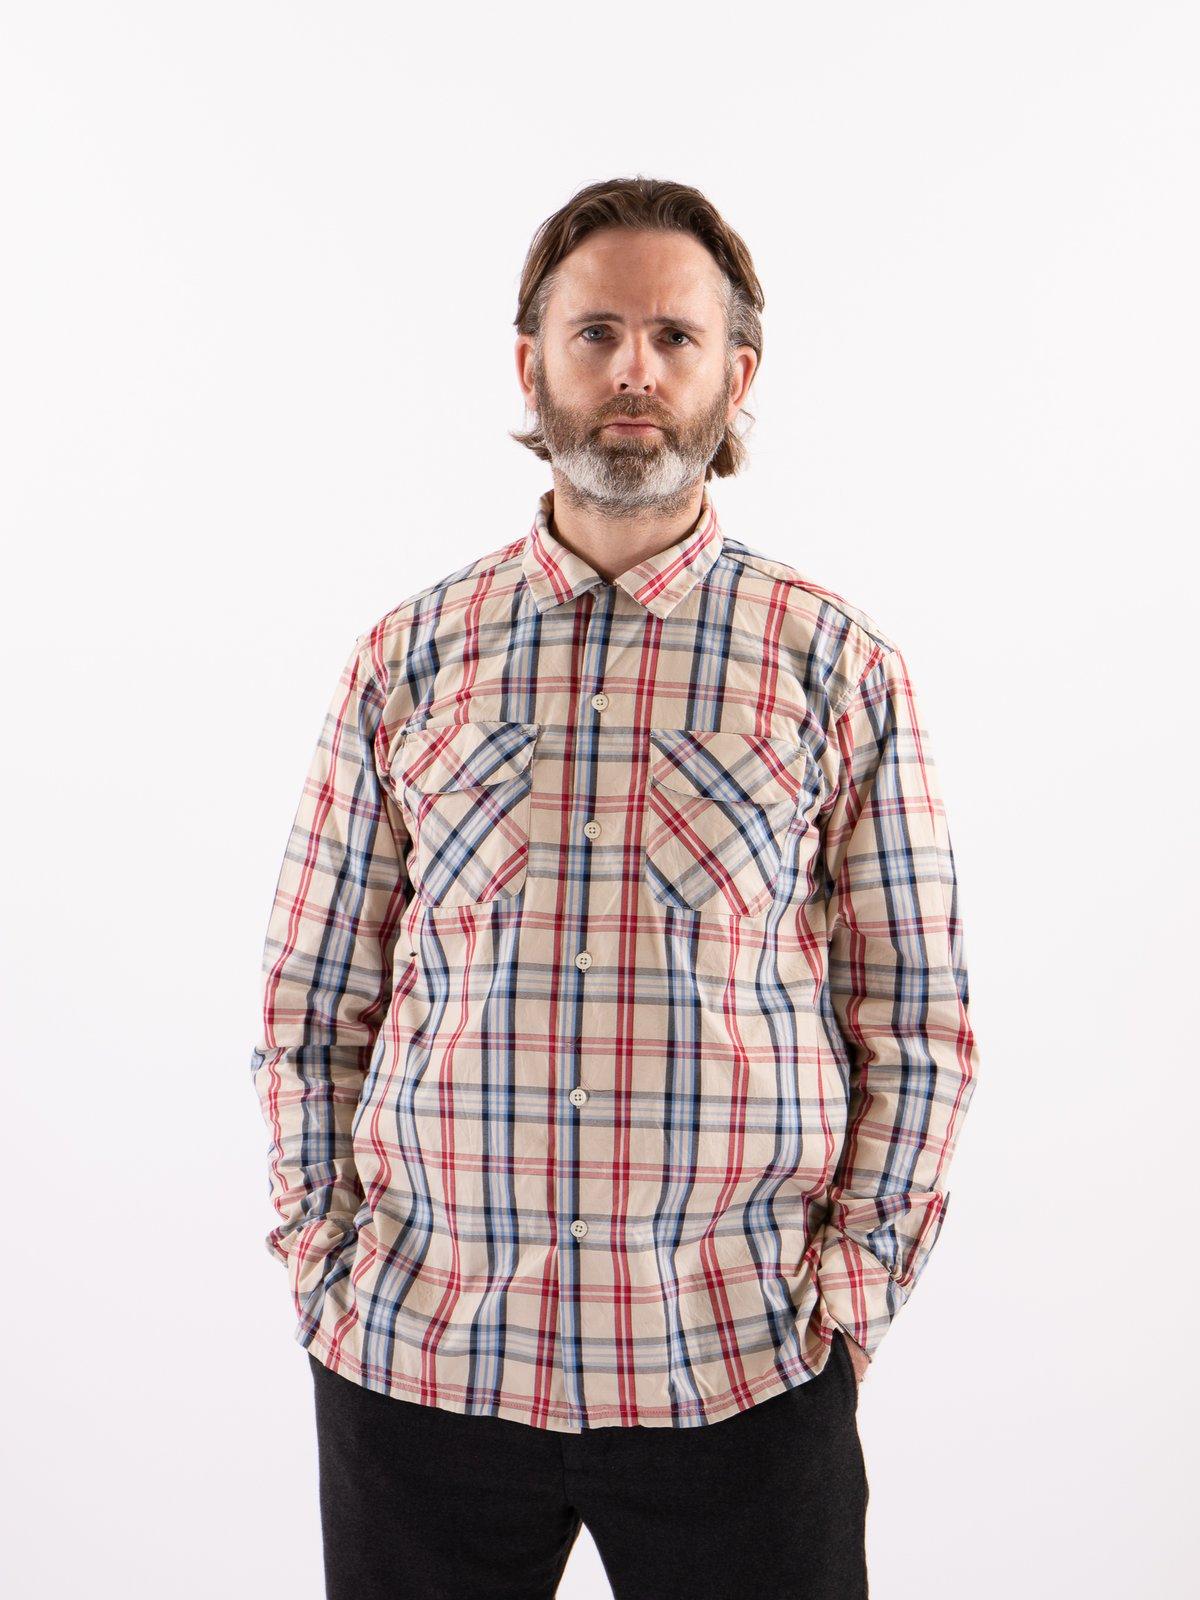 Khaki/Red/Blue Plaid Classic Shirt - Image 2